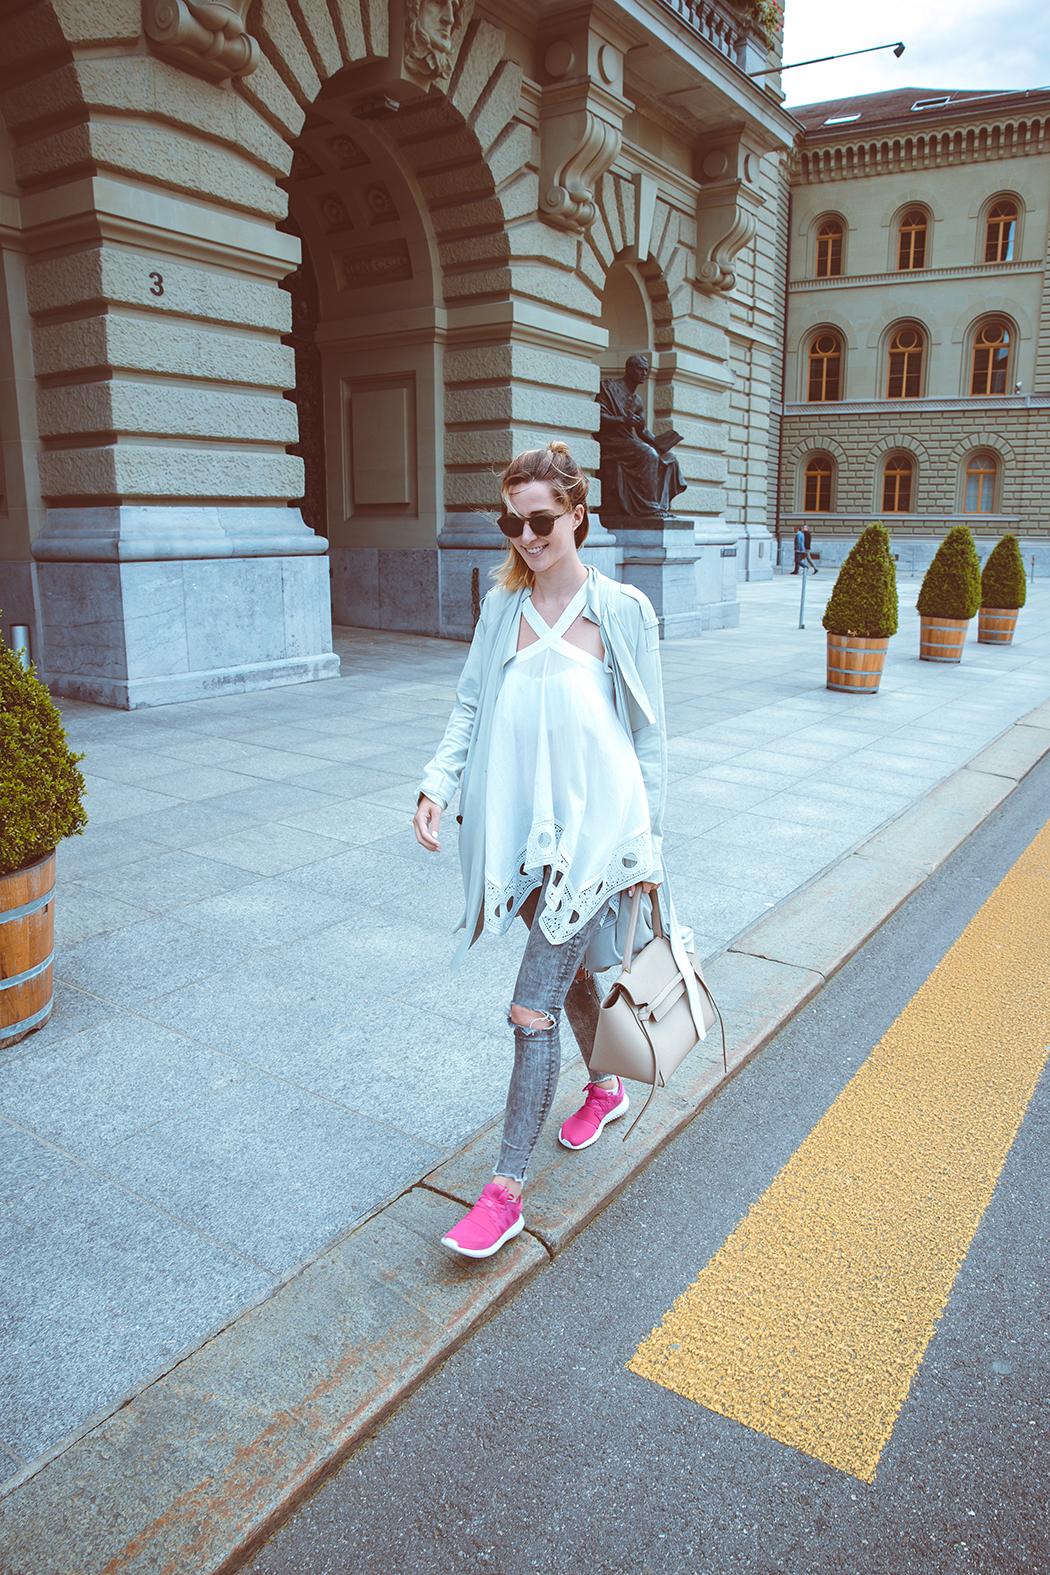 Fashionblog-Fashionblogger-Fashion-Blog-Blogger-Muenchen-Deutschland-Lindarella-Edited-thelabel-pinke_Adidas-Sneaker-2-web